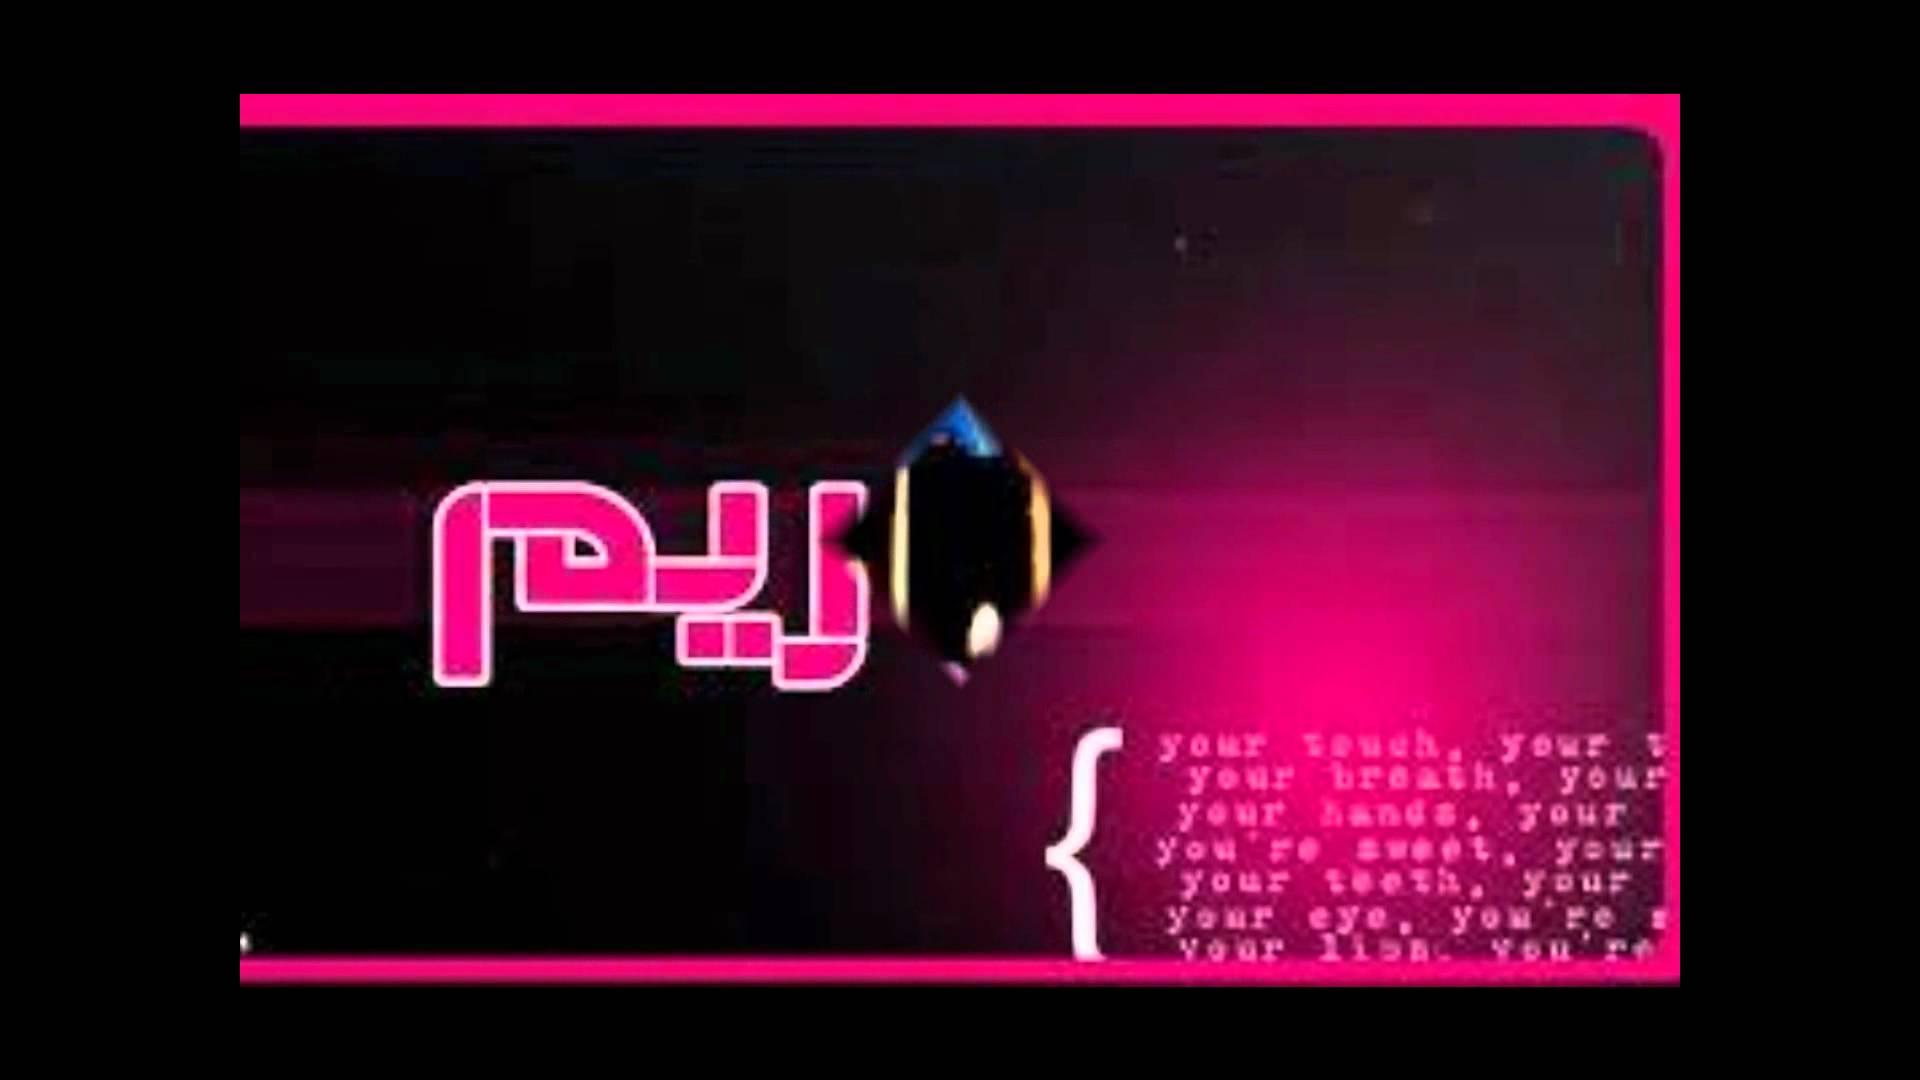 بالصور خلفيات اسم ريم , اجمل خلفيات شيك لاسم ريم 9288 3